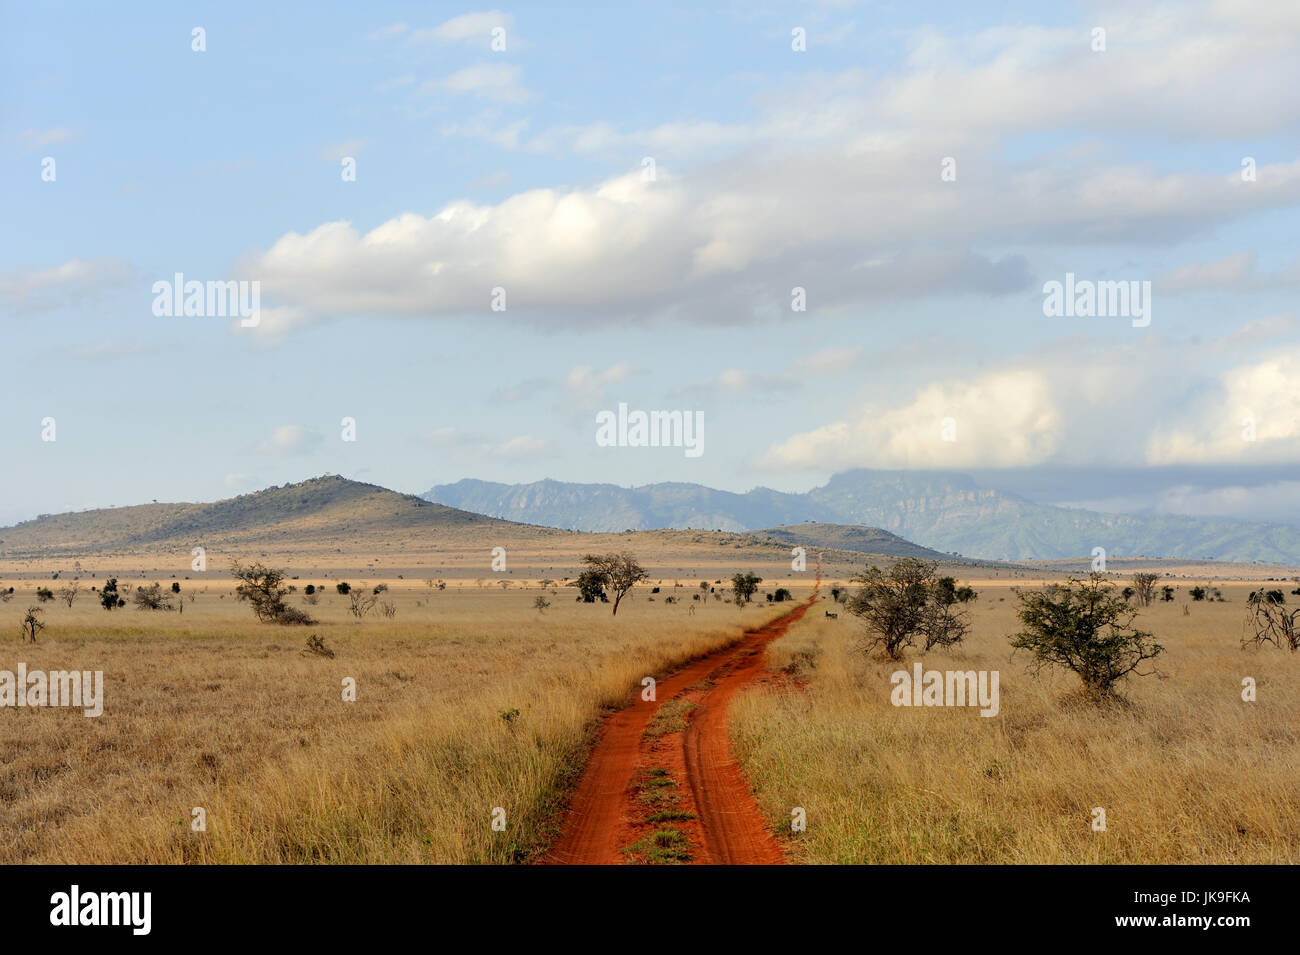 Paisaje de sabana en el parque nacional en Kenya, Africa. Imagen De Stock